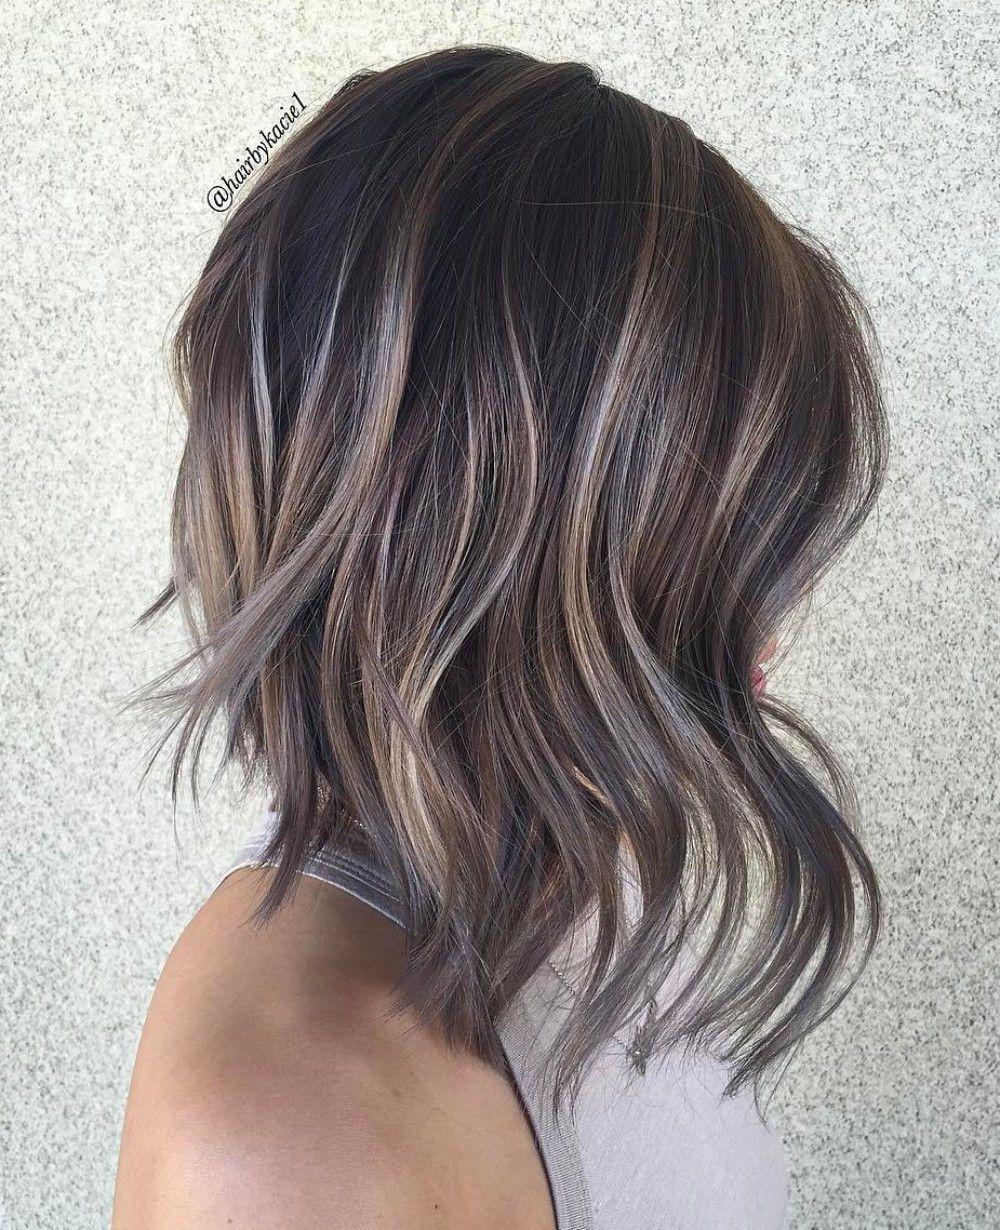 Dark Brown Bob With Subtle Metallic Highlights Short Hair Highlights Hair Styles Hair Color